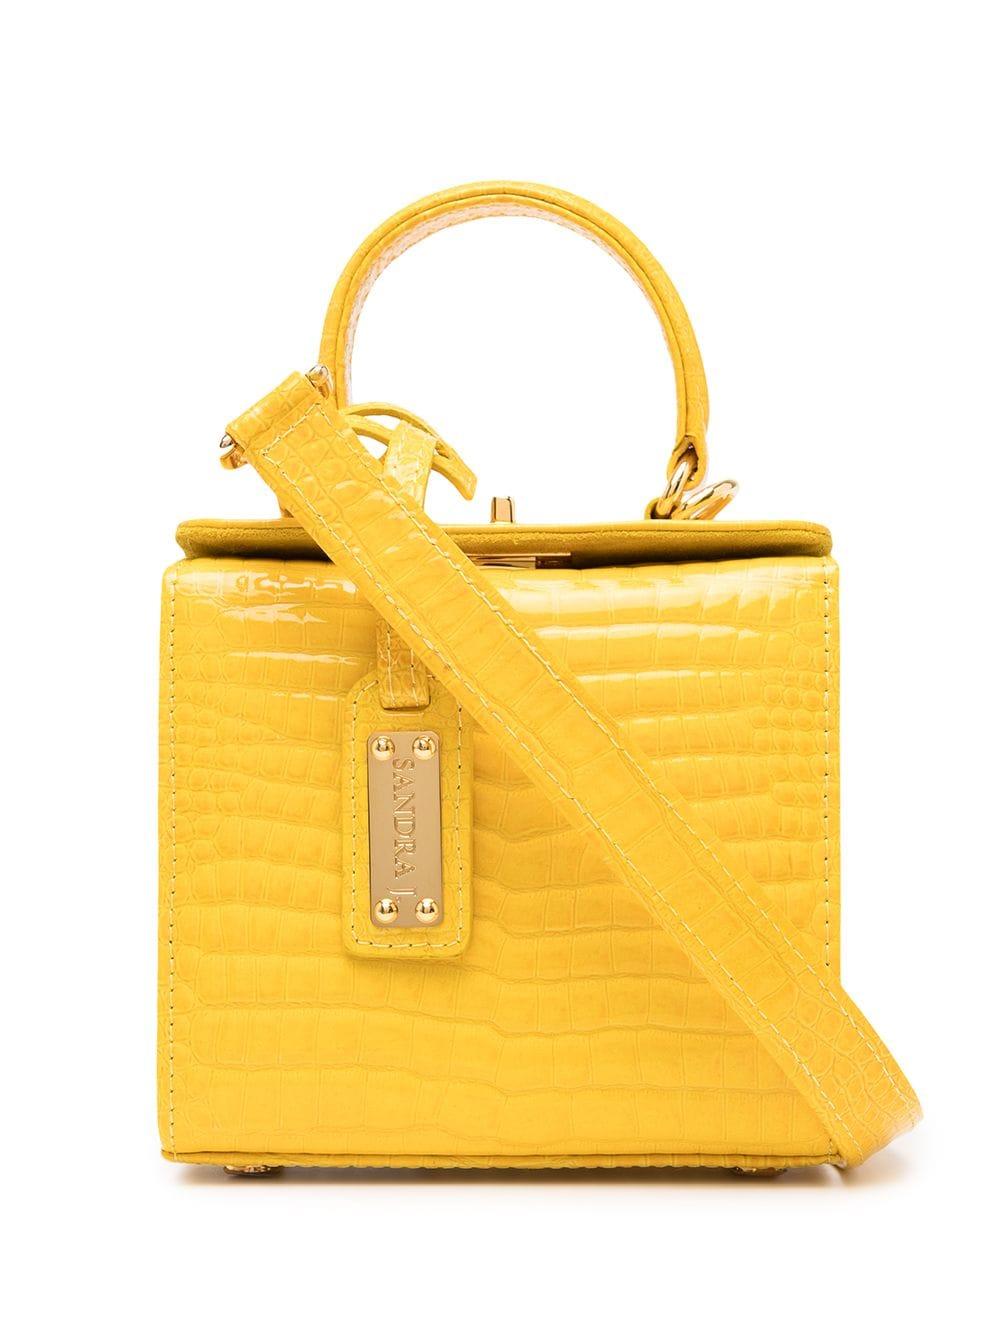 Sandra J Handtasche mit Kroko-Effekt - Gelb